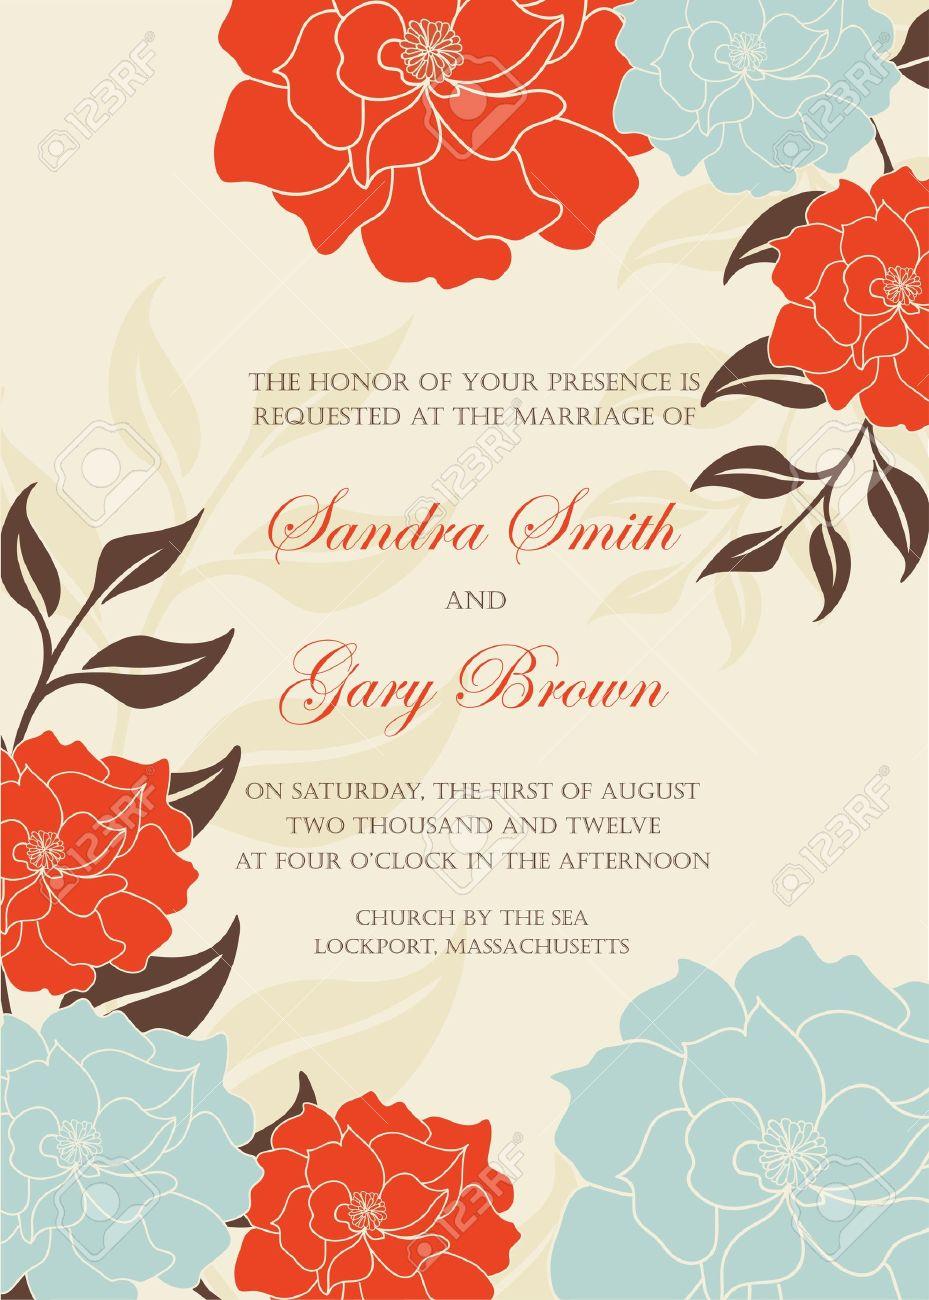 Floral Wedding Invitation Template Illustration Stock Vector 20358170: Floral Wedding Invitation Template Hd At Reisefeber.org